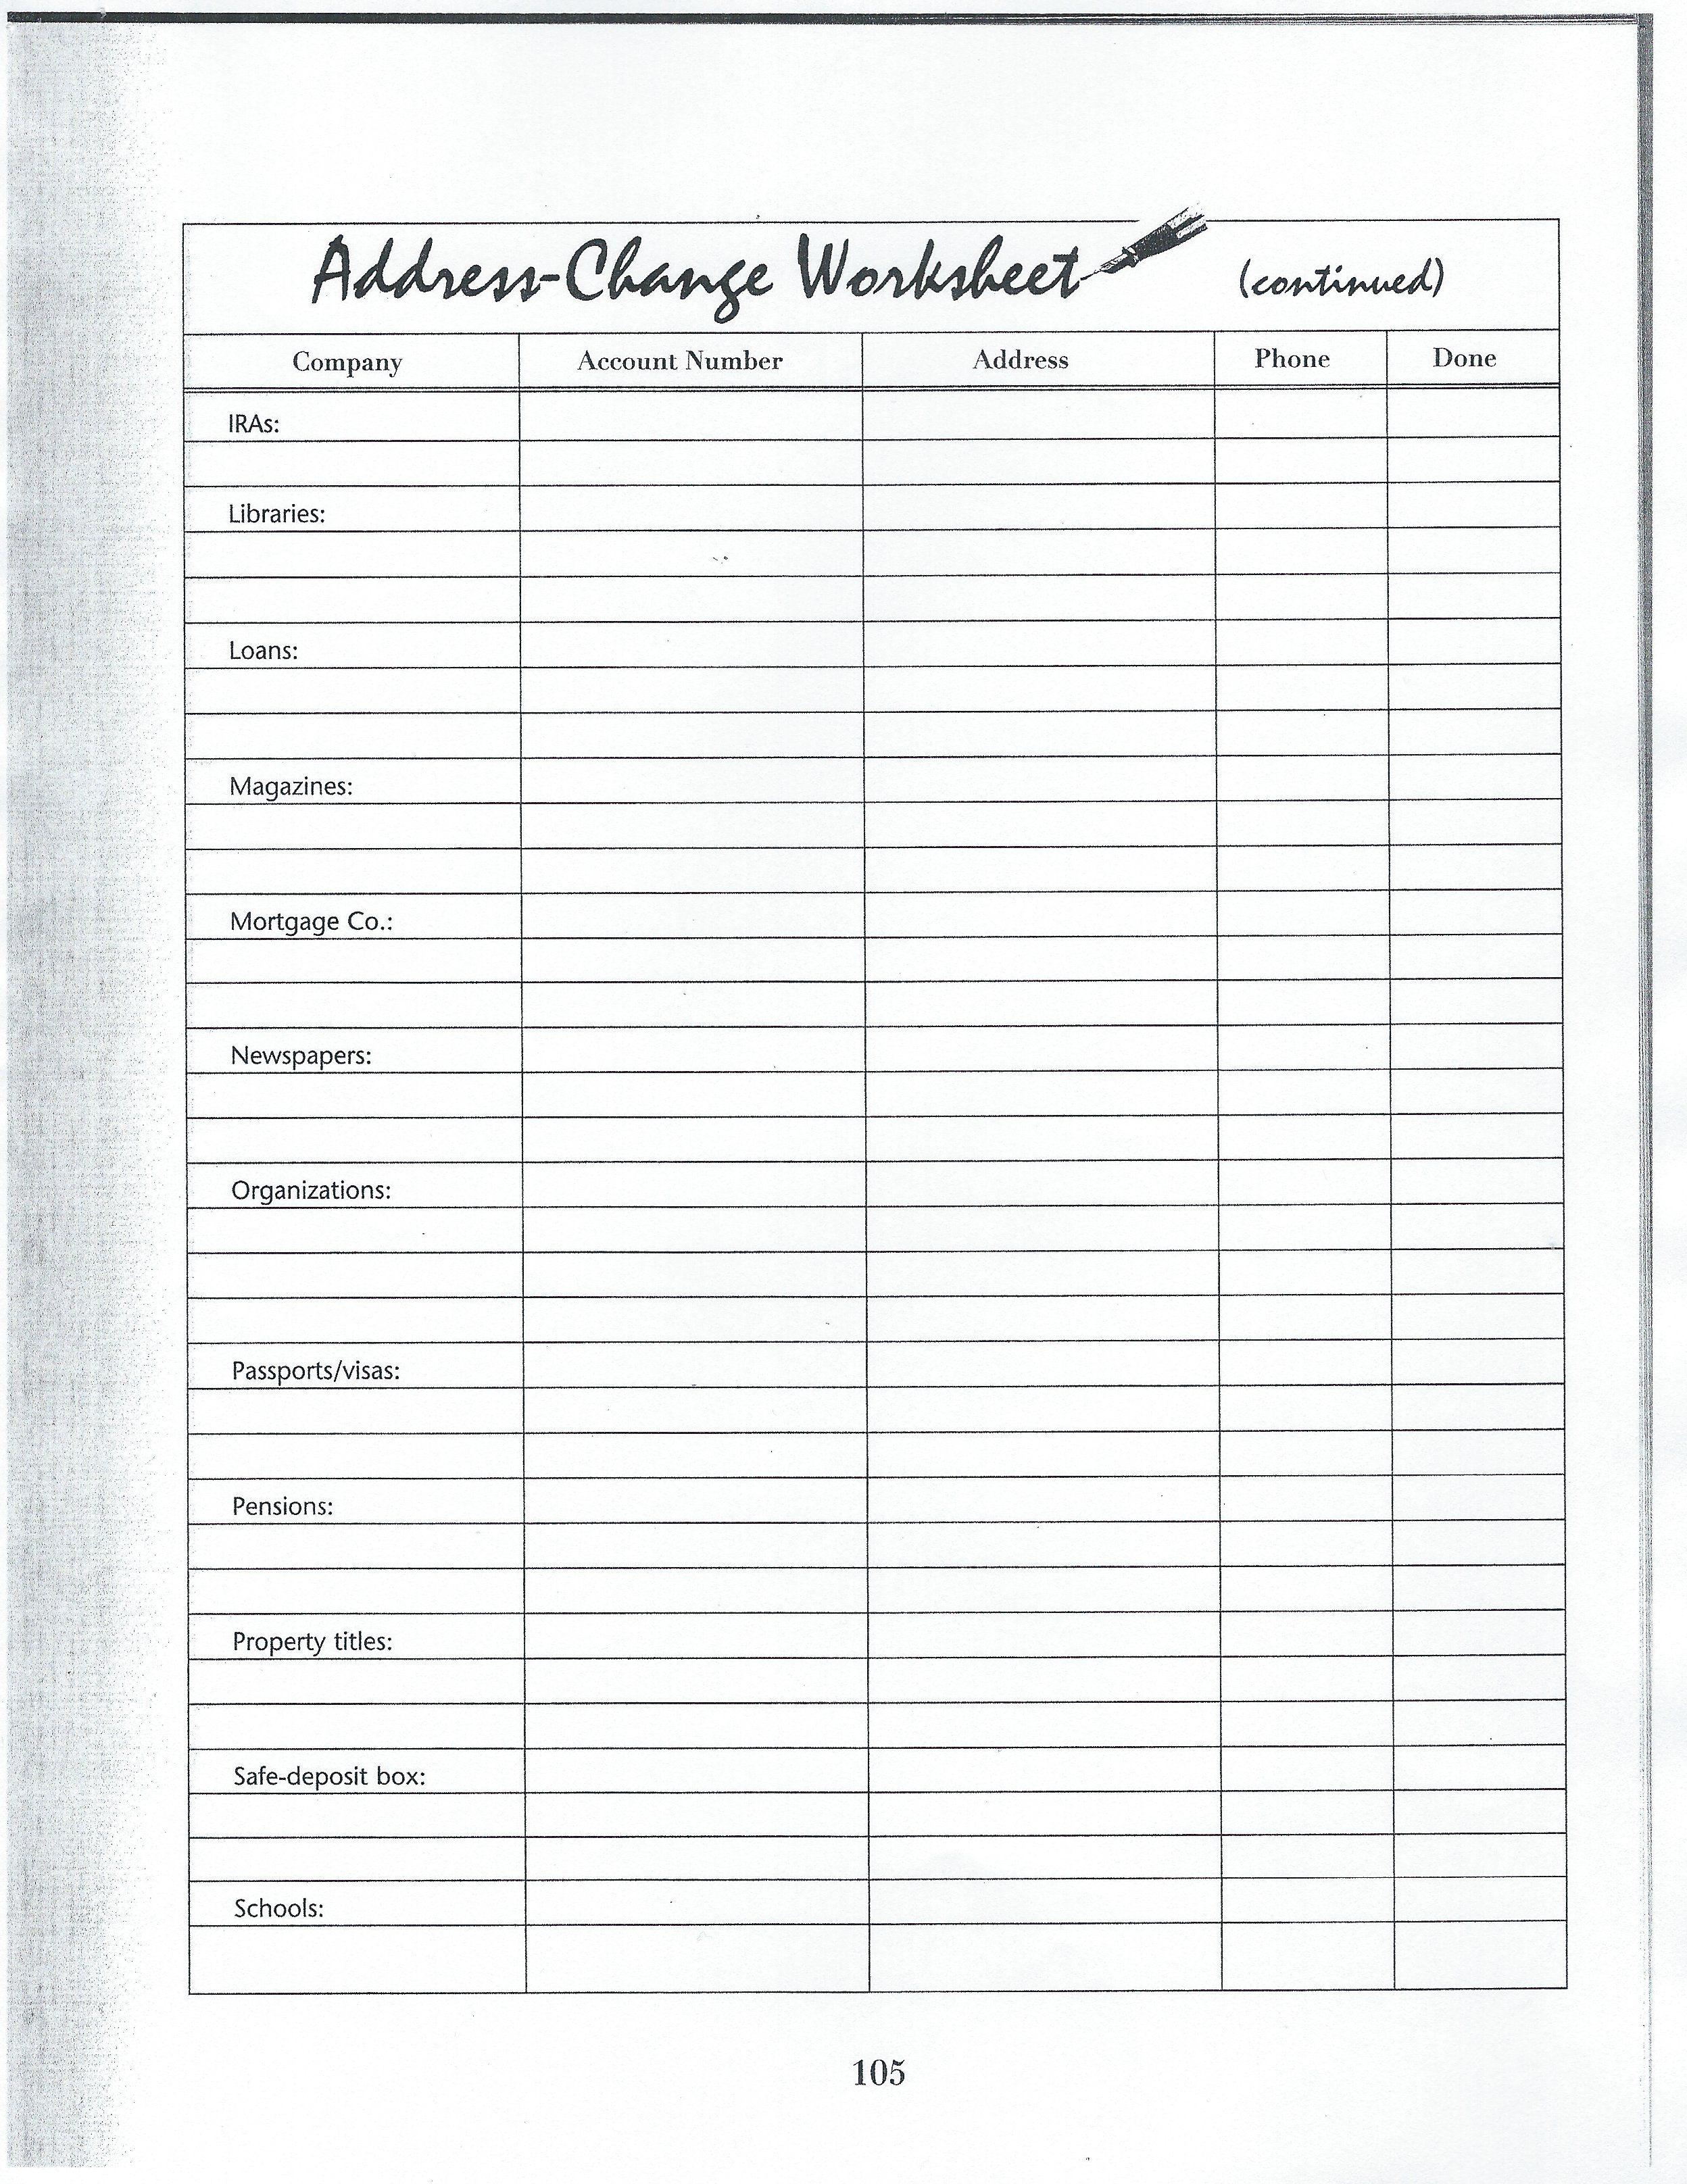 Address Change Worksheet 3